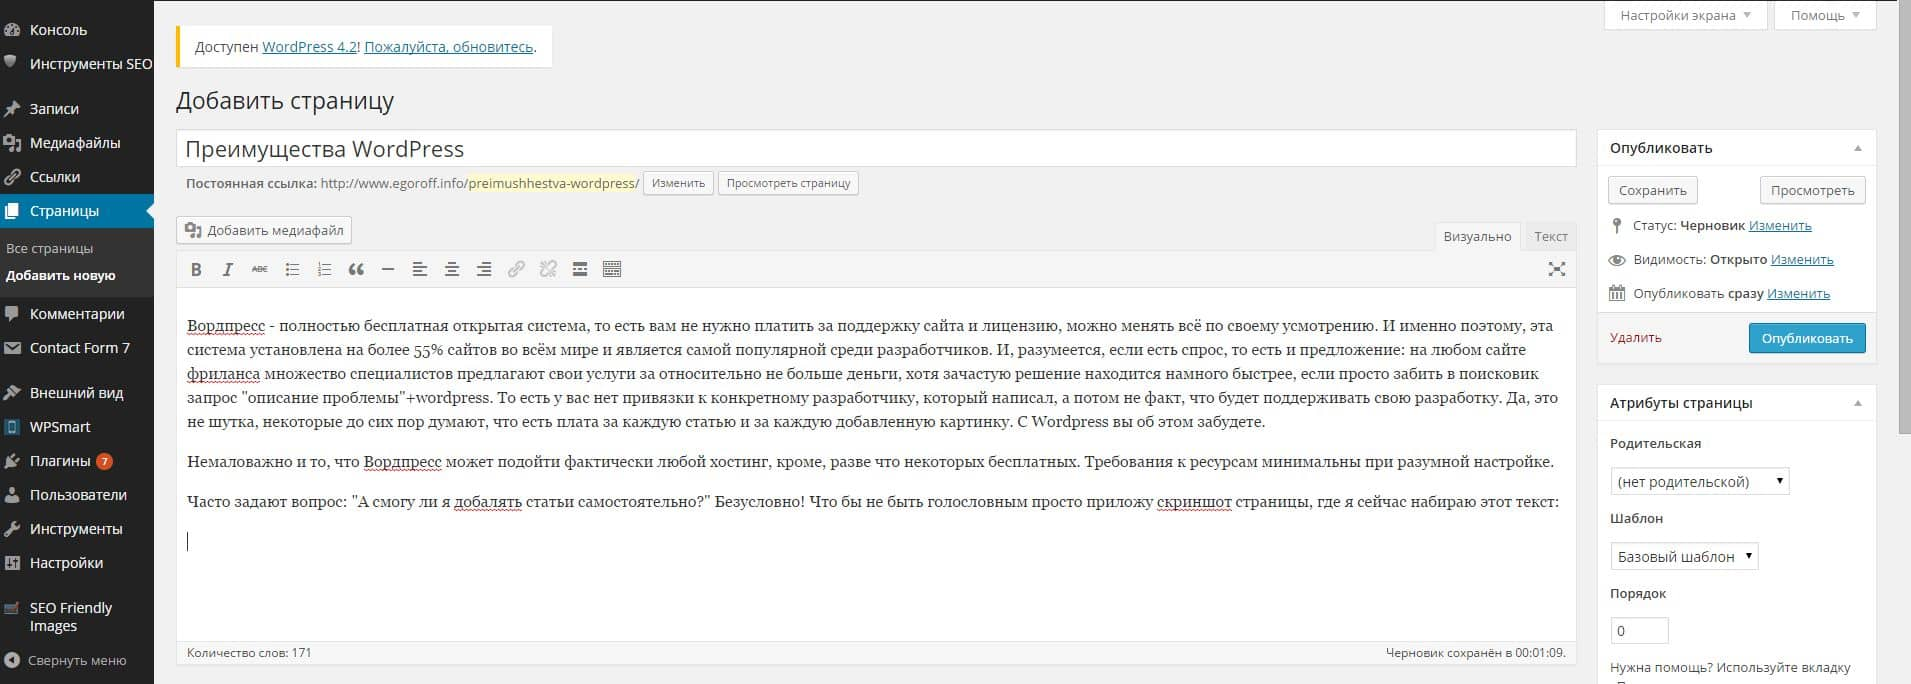 Редактор в WordPress